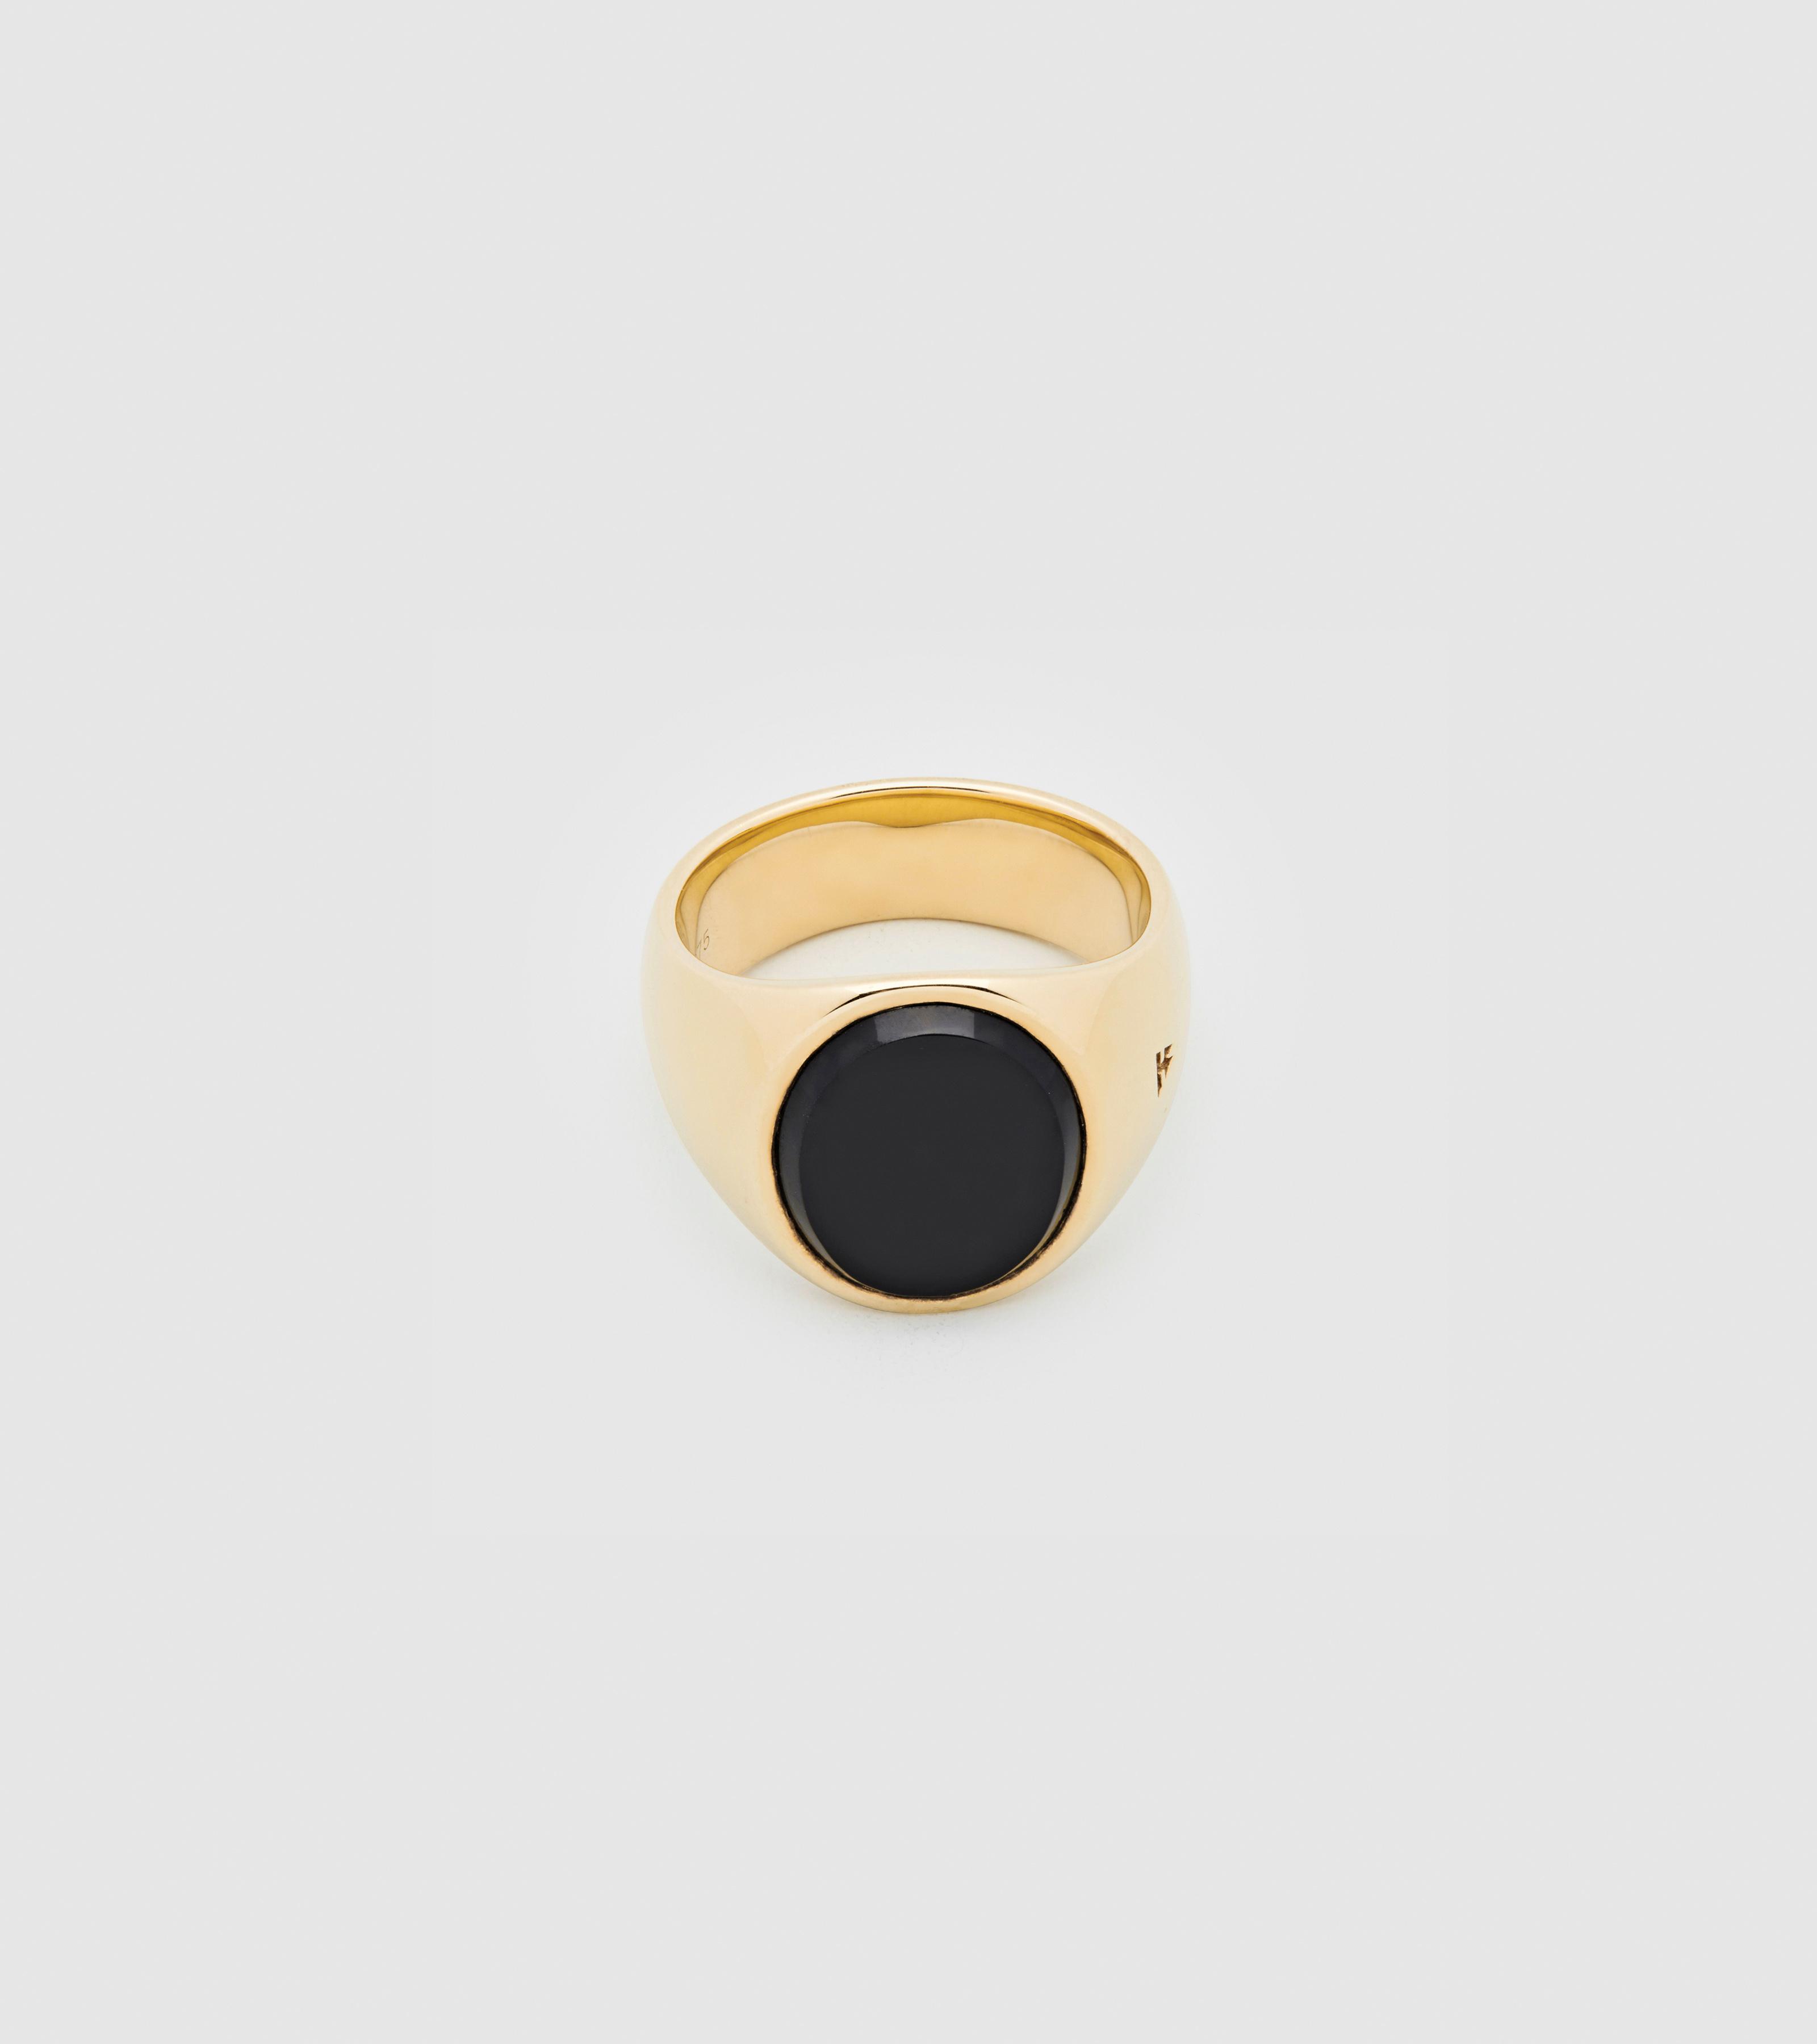 Oval Gold Black Onyx